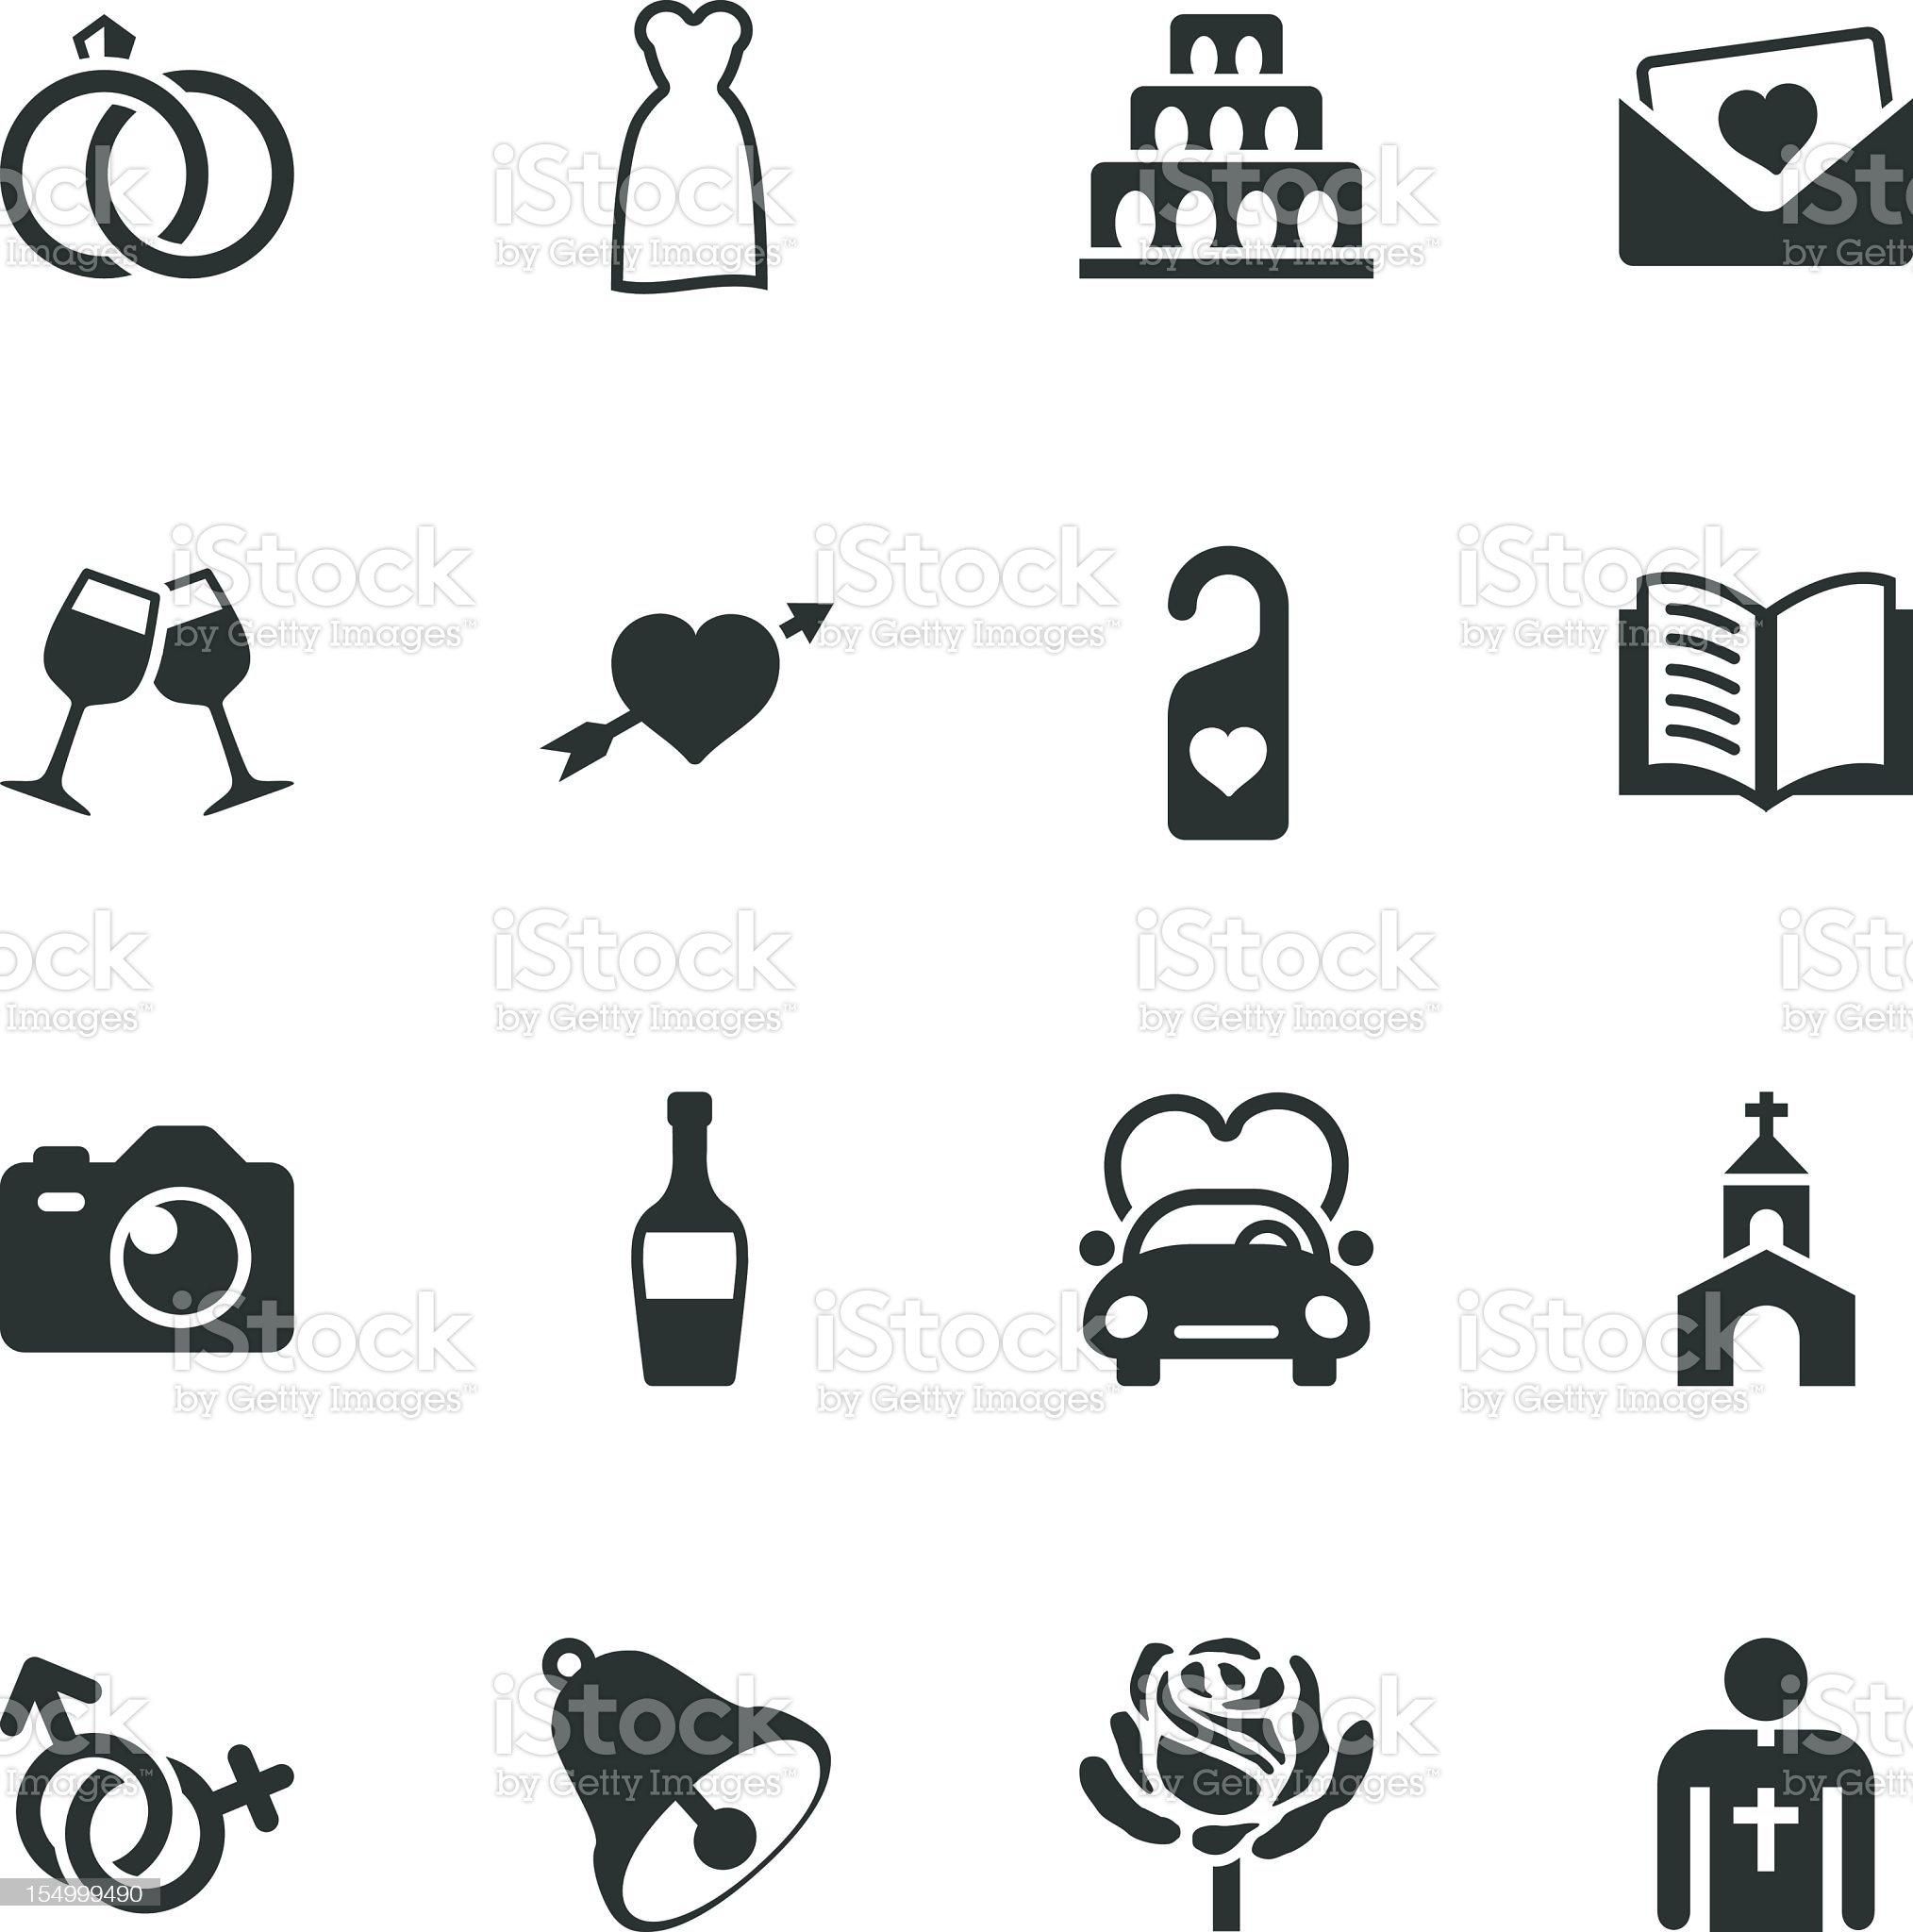 Wedding Silhouette Icons royalty-free stock photo